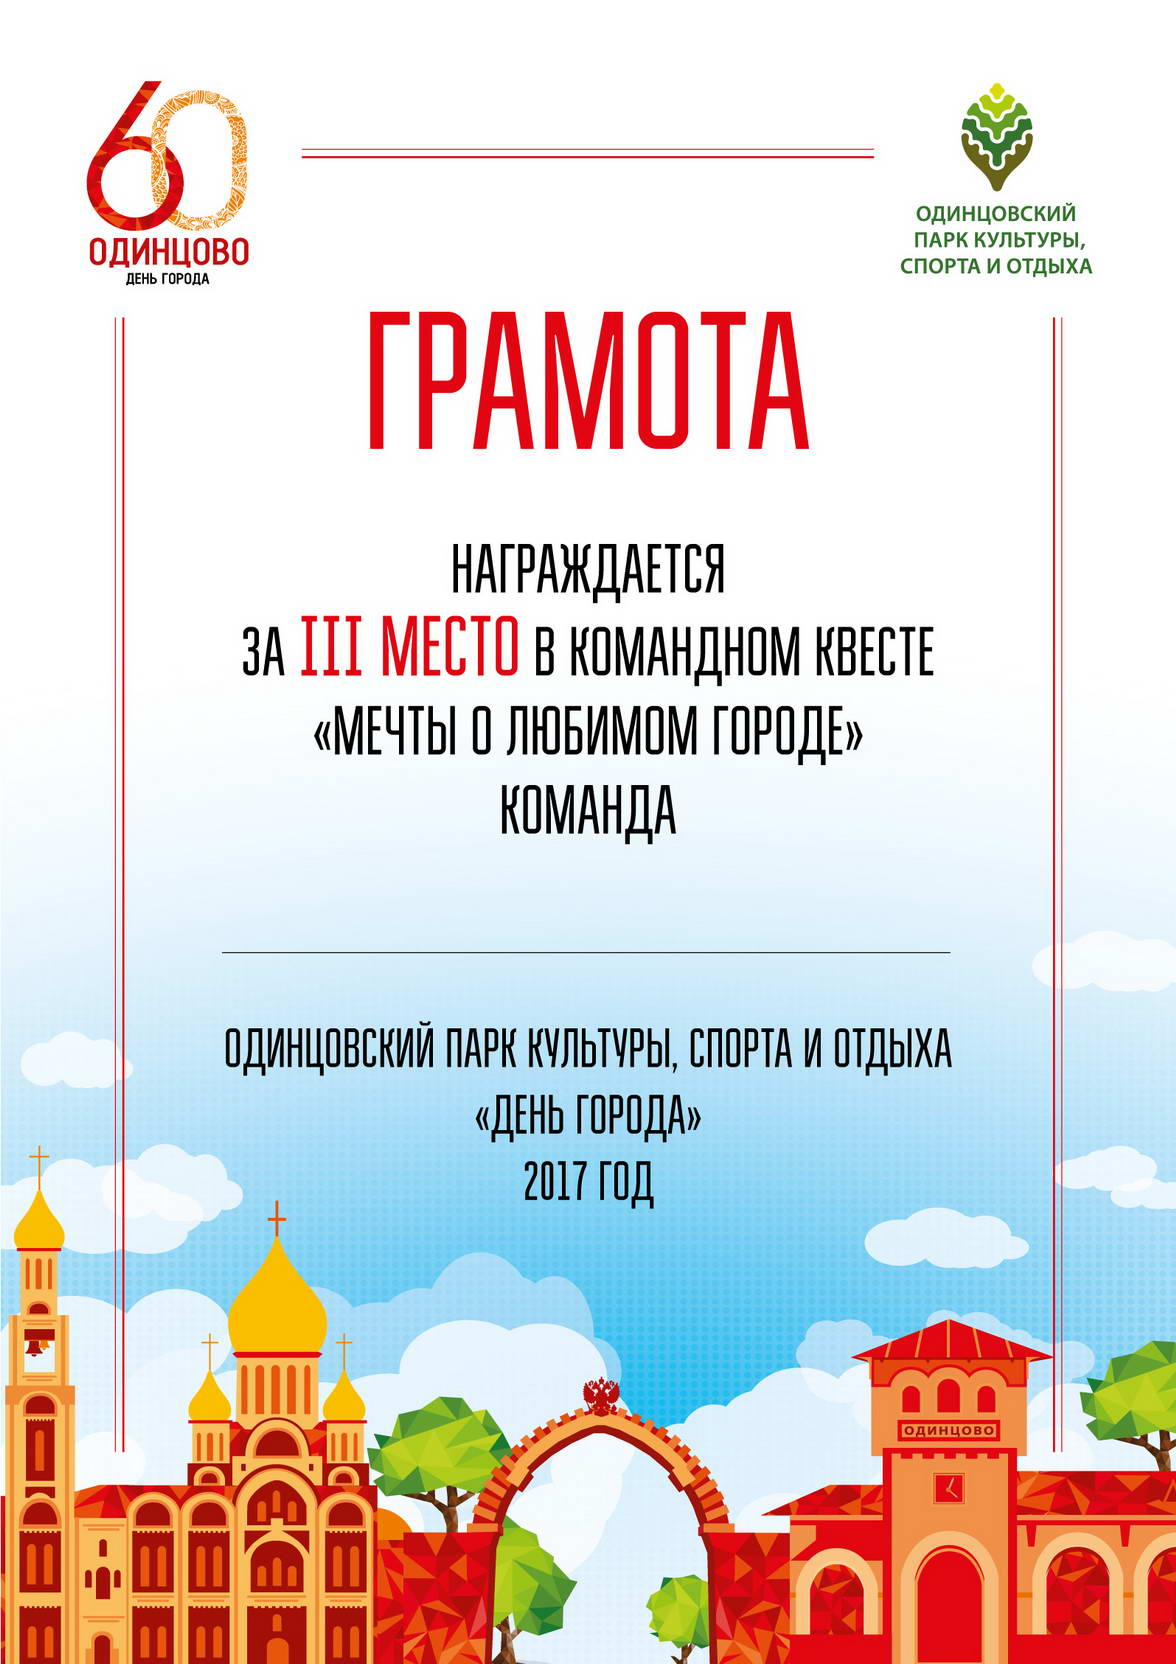 dan Одинцово 2 сентября дизайн грамоты Одинцовский парк